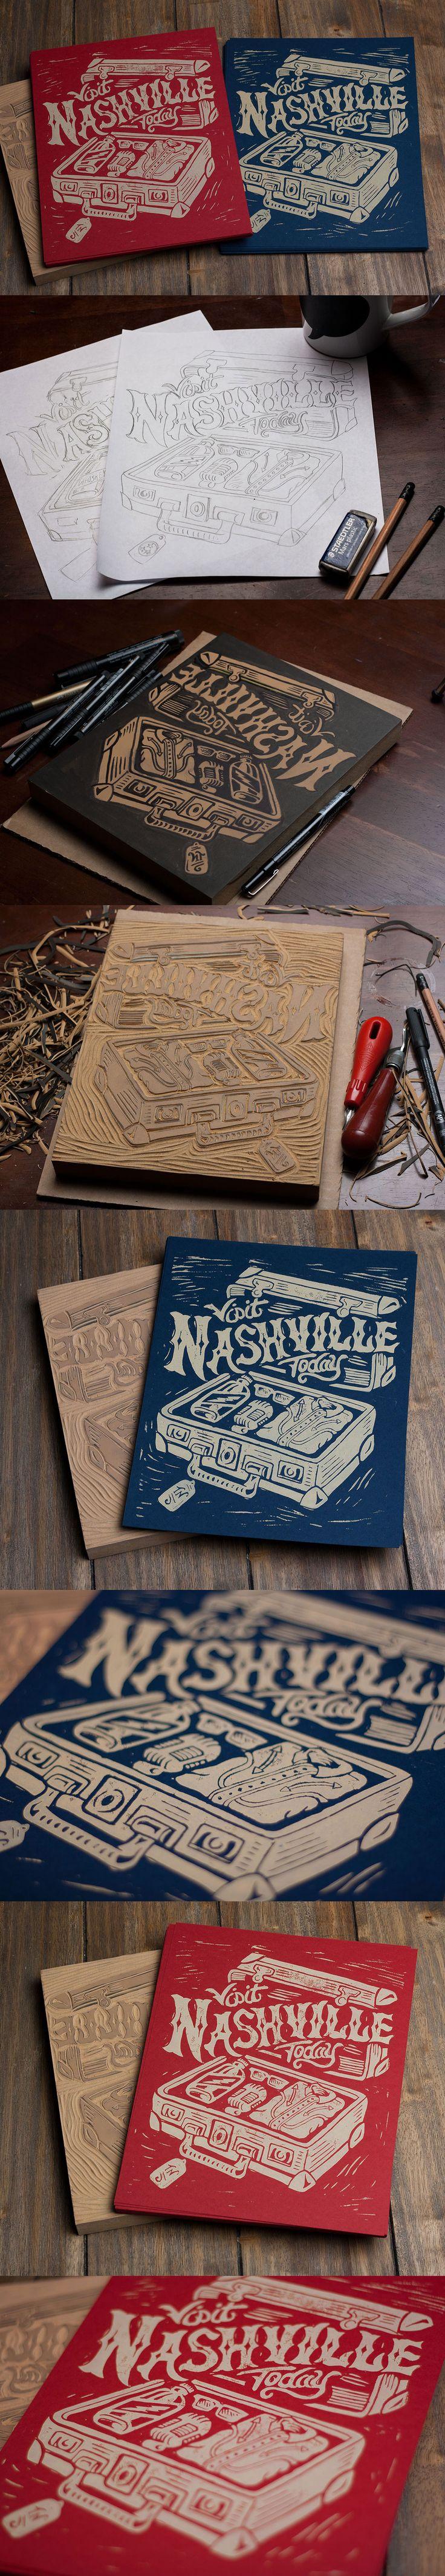 Visit Nashville Today - Block Print by Derrick Castle #block print #design …